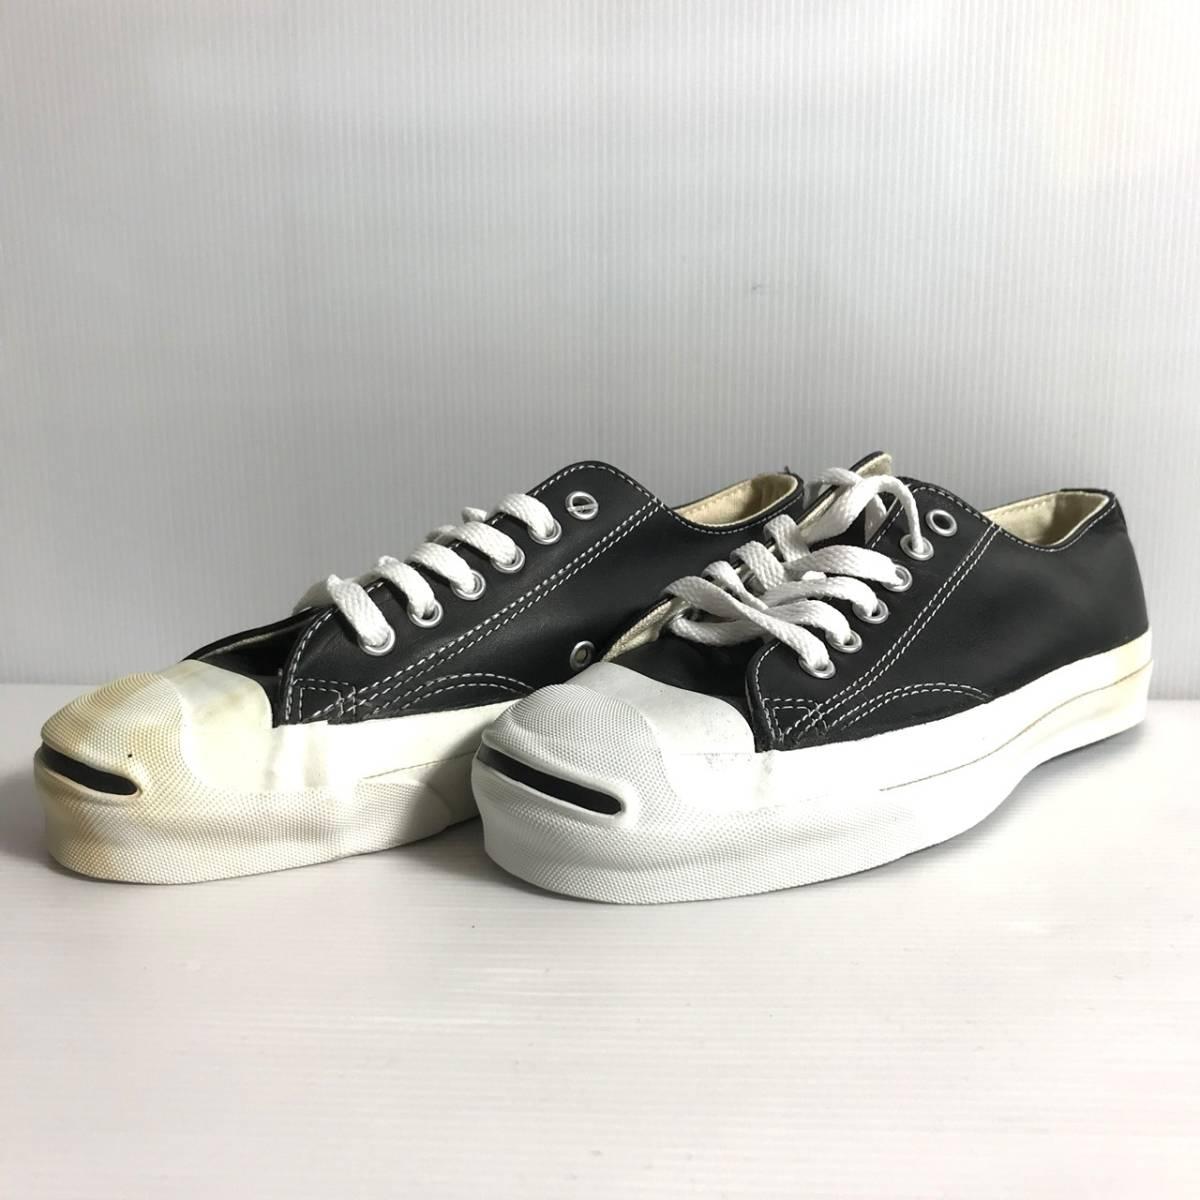 e8113c8588fb dead stock  90 S USA made  CONVERSE JACK PURCELL Converse leather Jack  purcell black 23cm